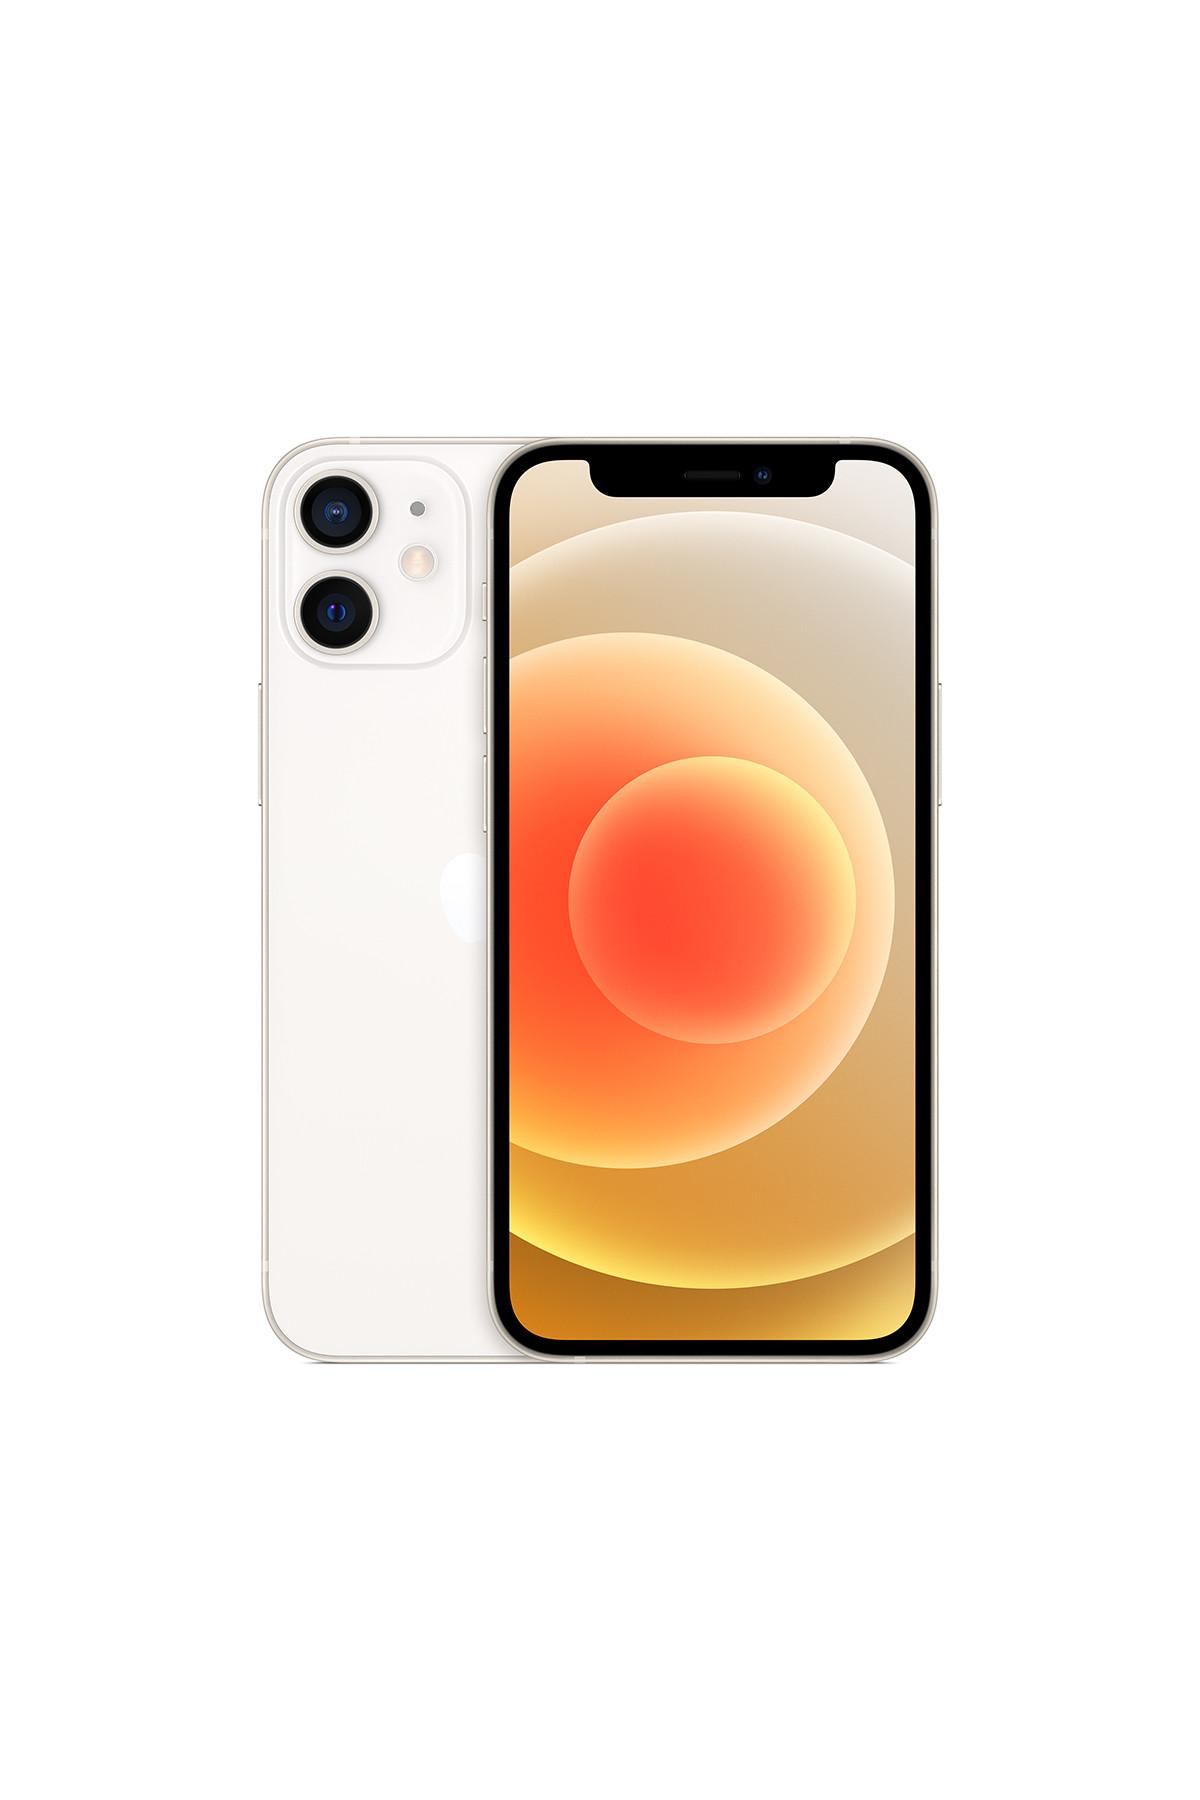 iPhone 12 Mini 256GB - White